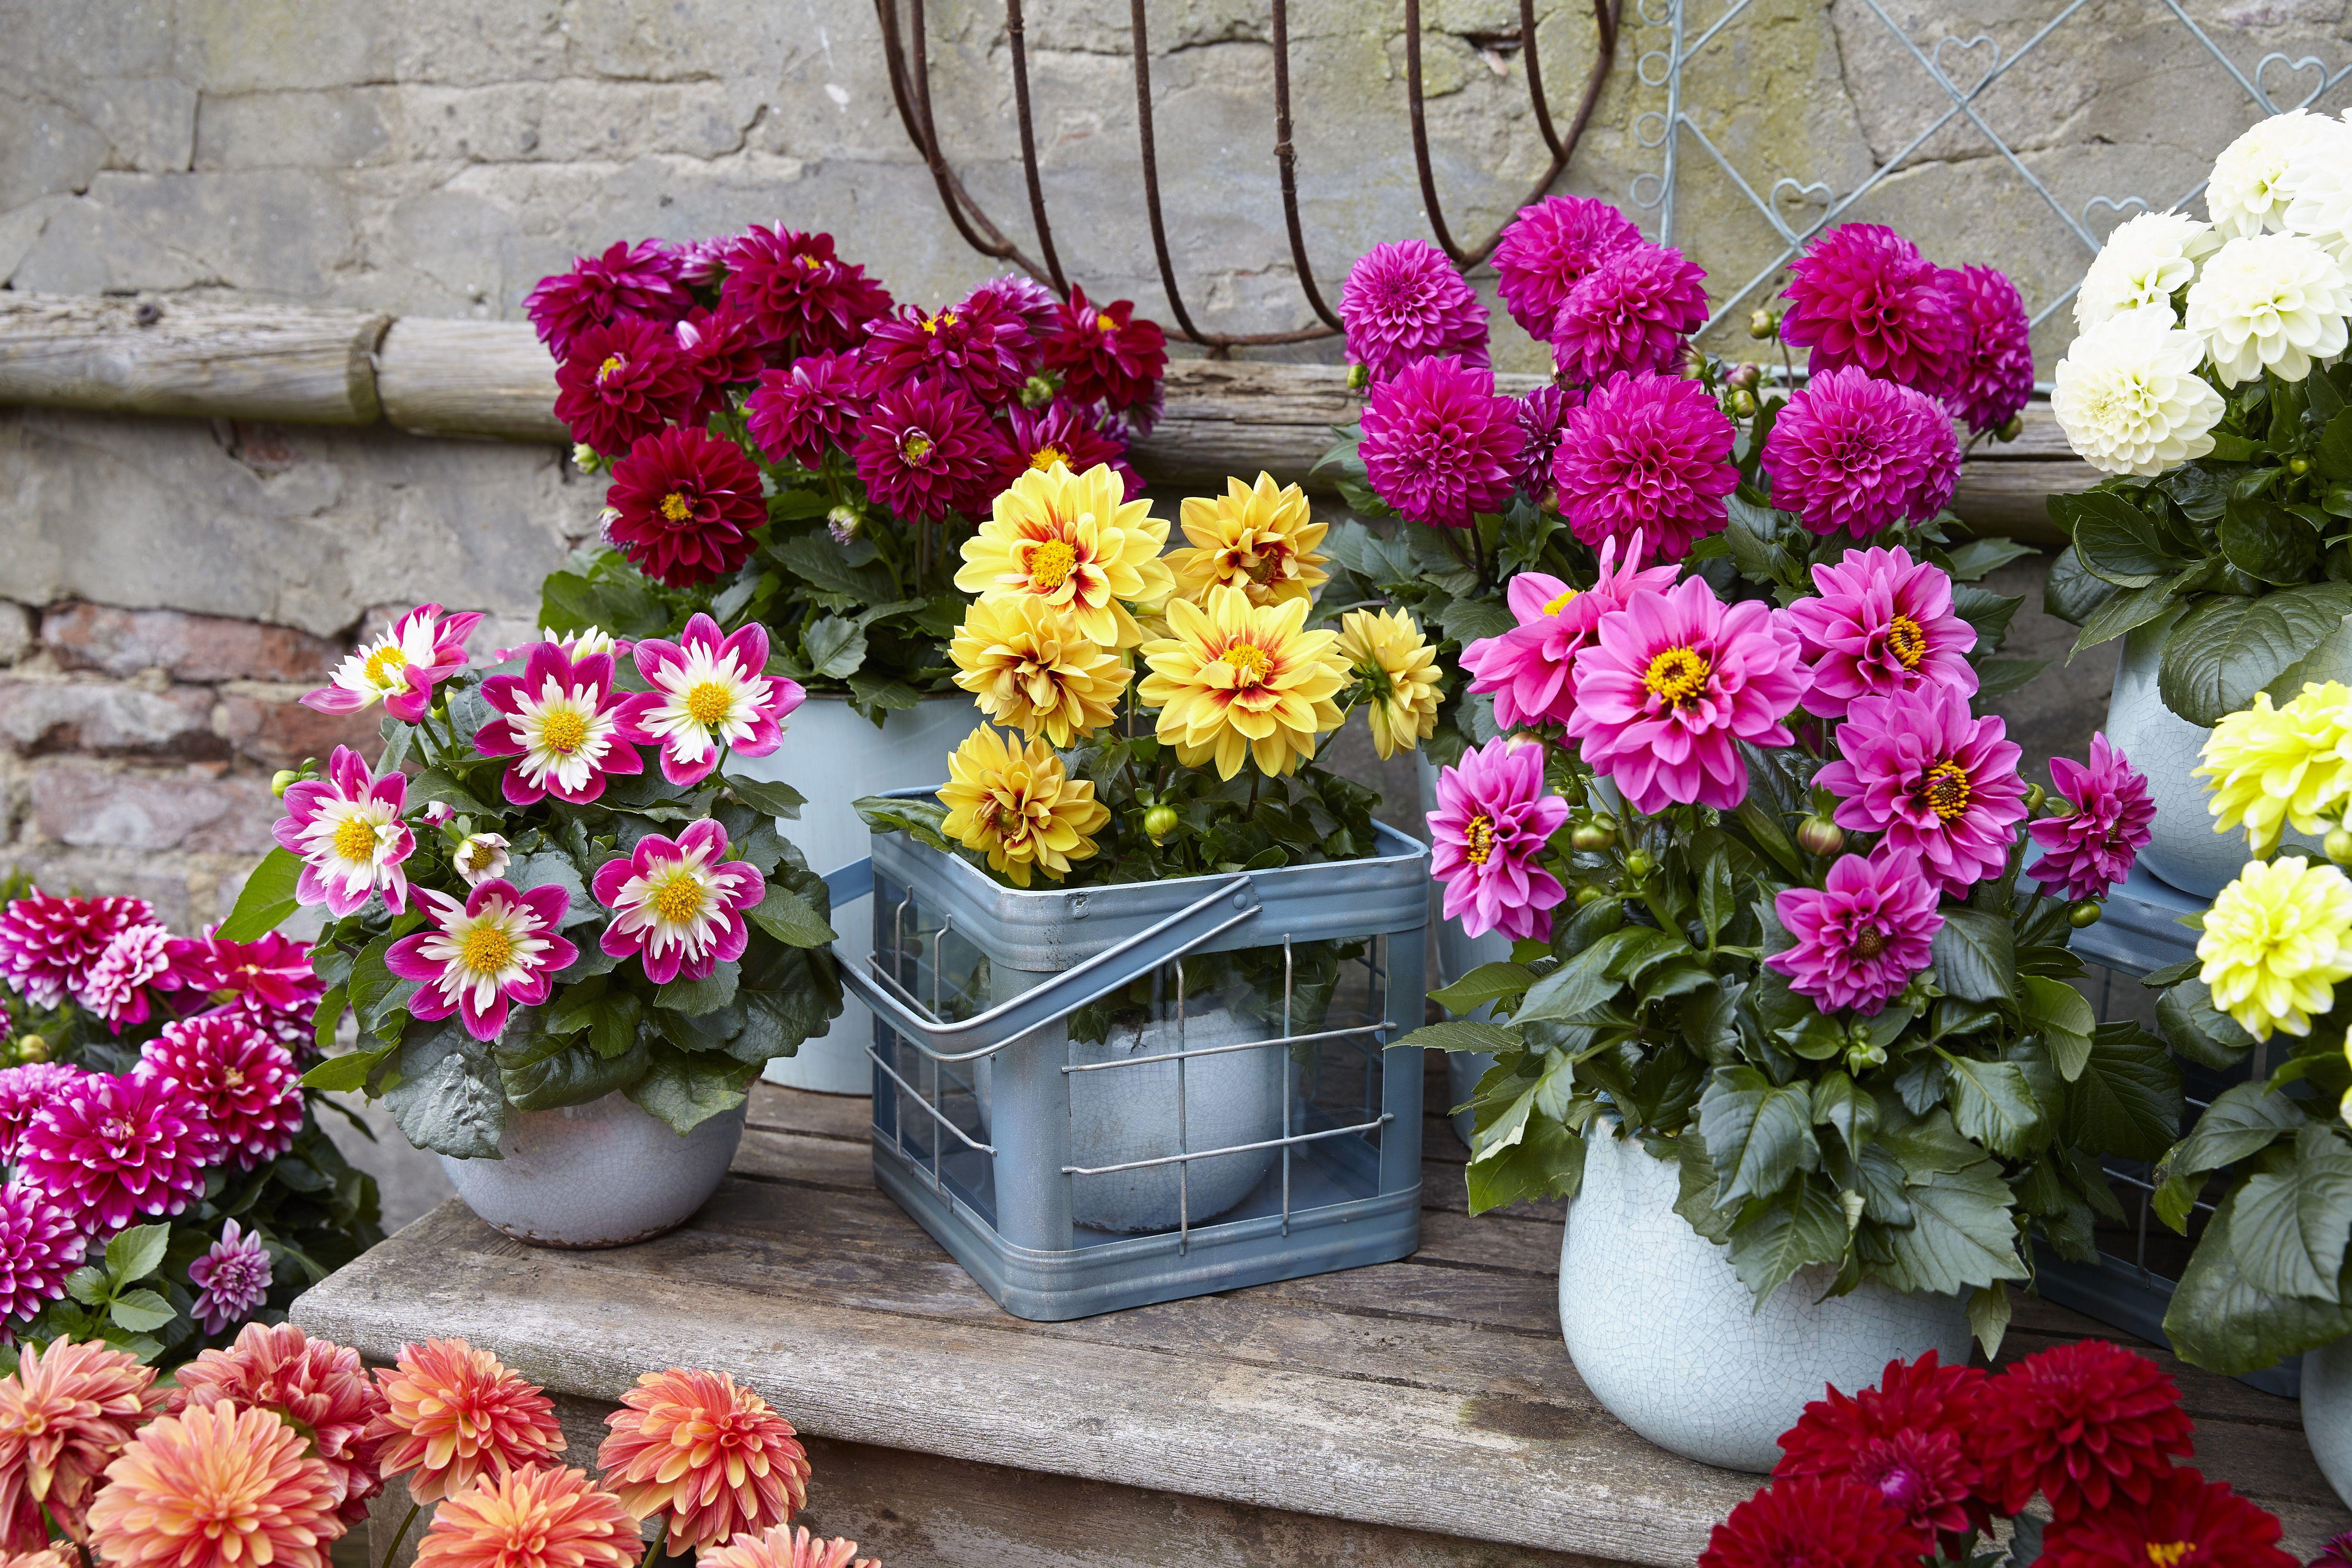 Labella Medio Mix Dahlia Is A Fun Dahlia The Perfect Size For Containers Around The Patio And Deck Yearofthedahlia Summer Bulbs Dahlias Garden Dahlia